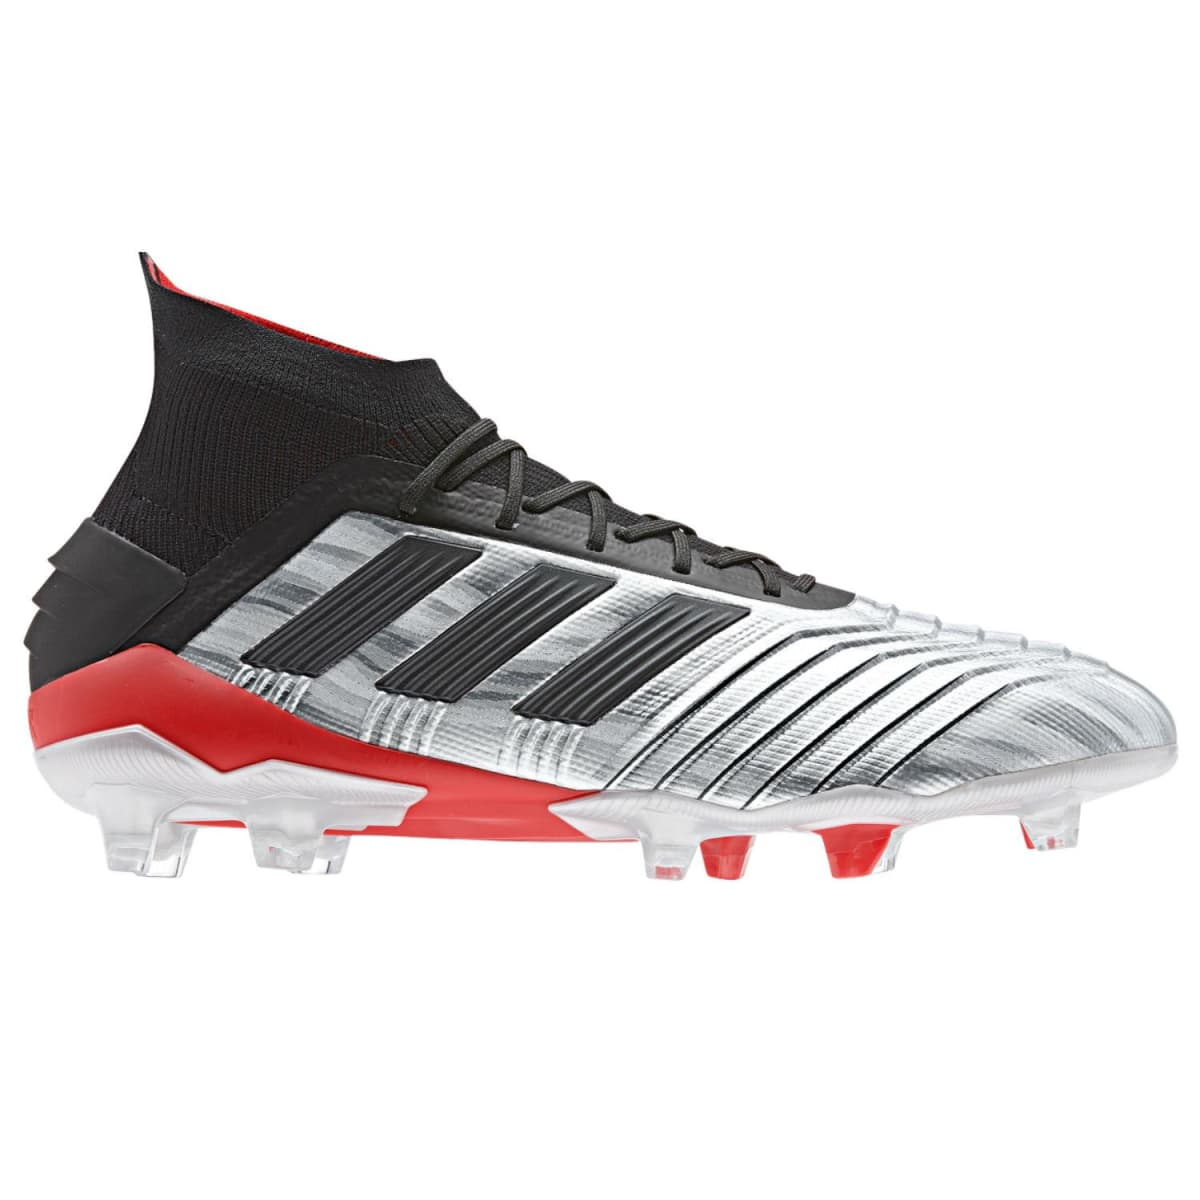 10d61462b722 Men | Soccer Boots | Sportsmans Warehouse